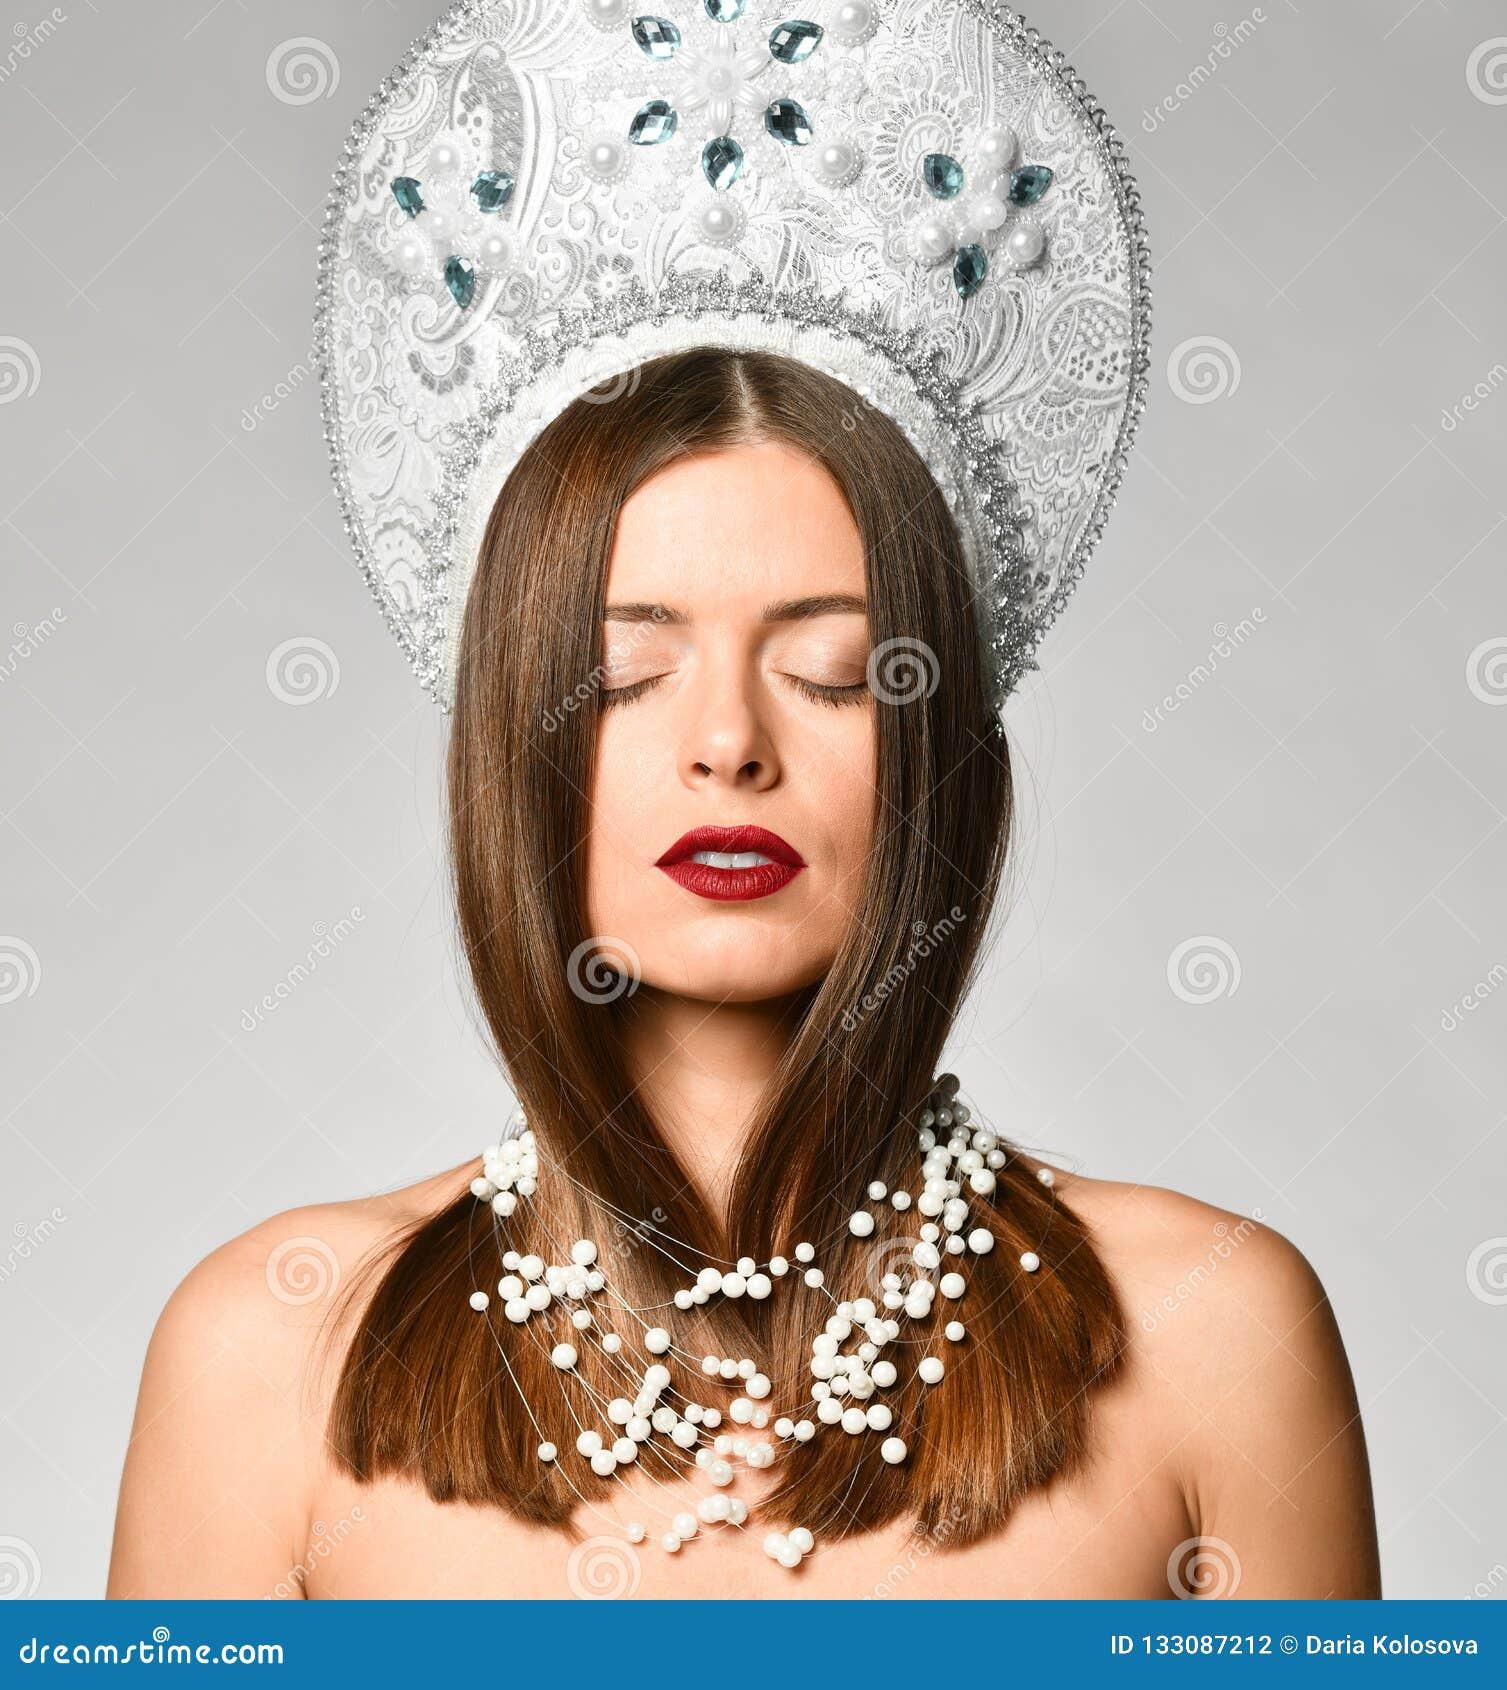 https://thumbs.dreamstime.com/z/pensive-beautiful-russian-woman-kokoshnik-cap-her-eyes-closed-against-white-background-dreams-russian-beauty-pensive-133087212.jpg